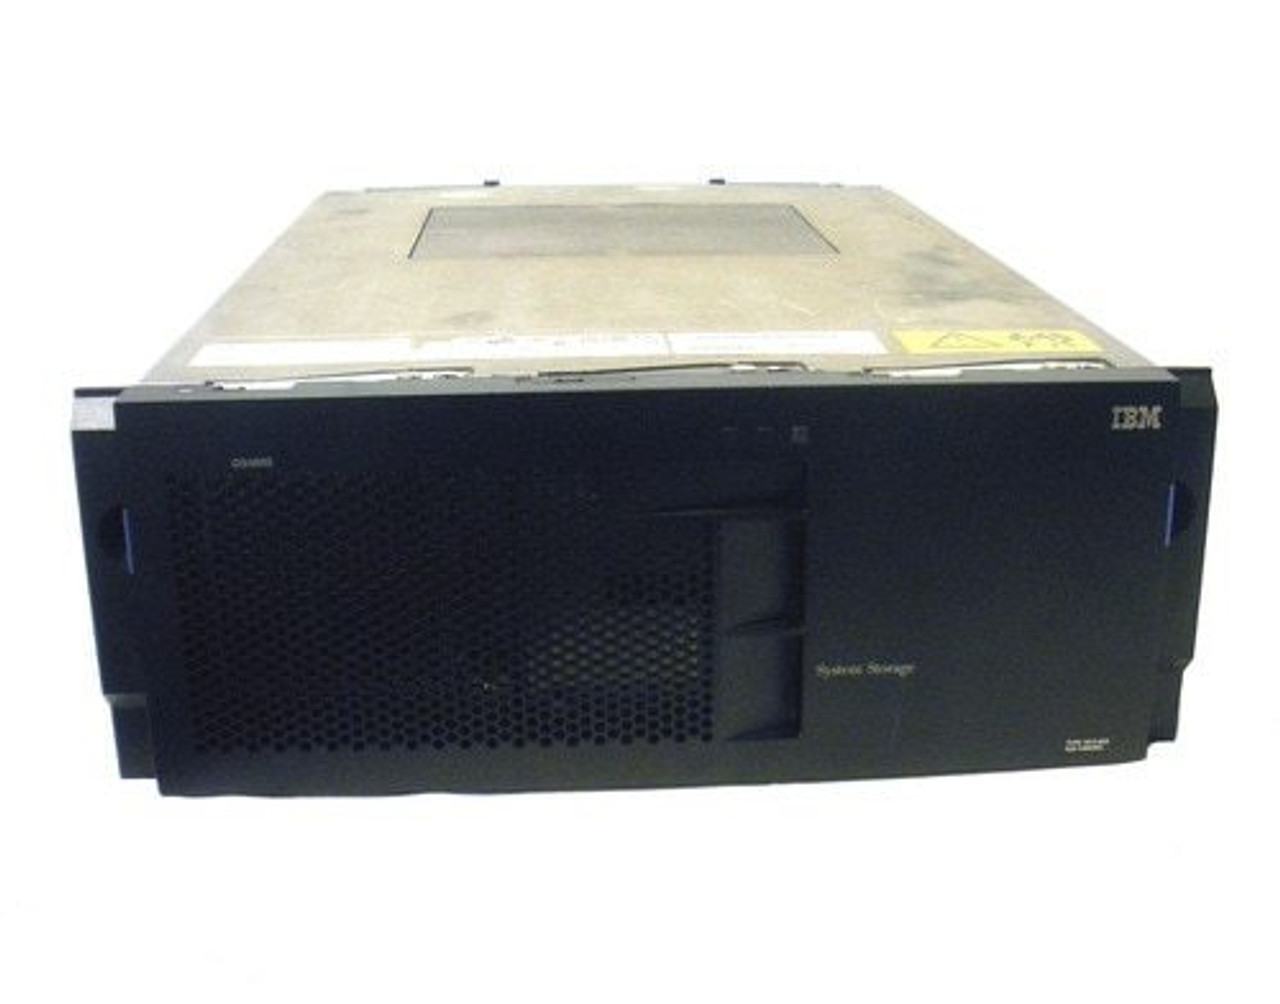 IBM DS4800 Series